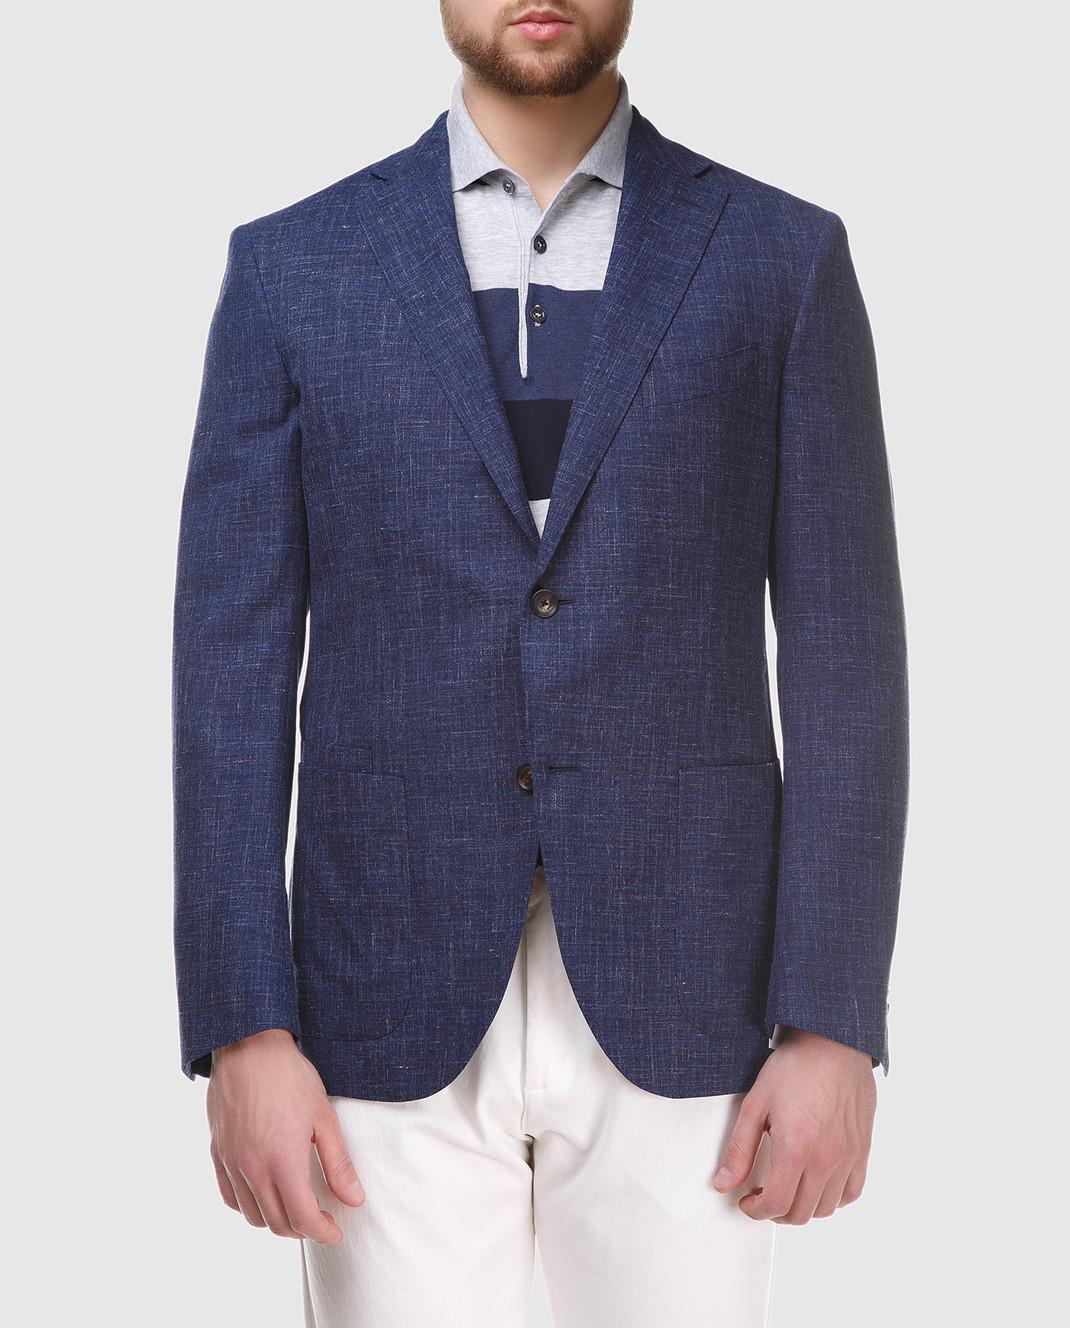 Luciano Barbera Темно-синий блейзер из шерсти и льна 111A2518164